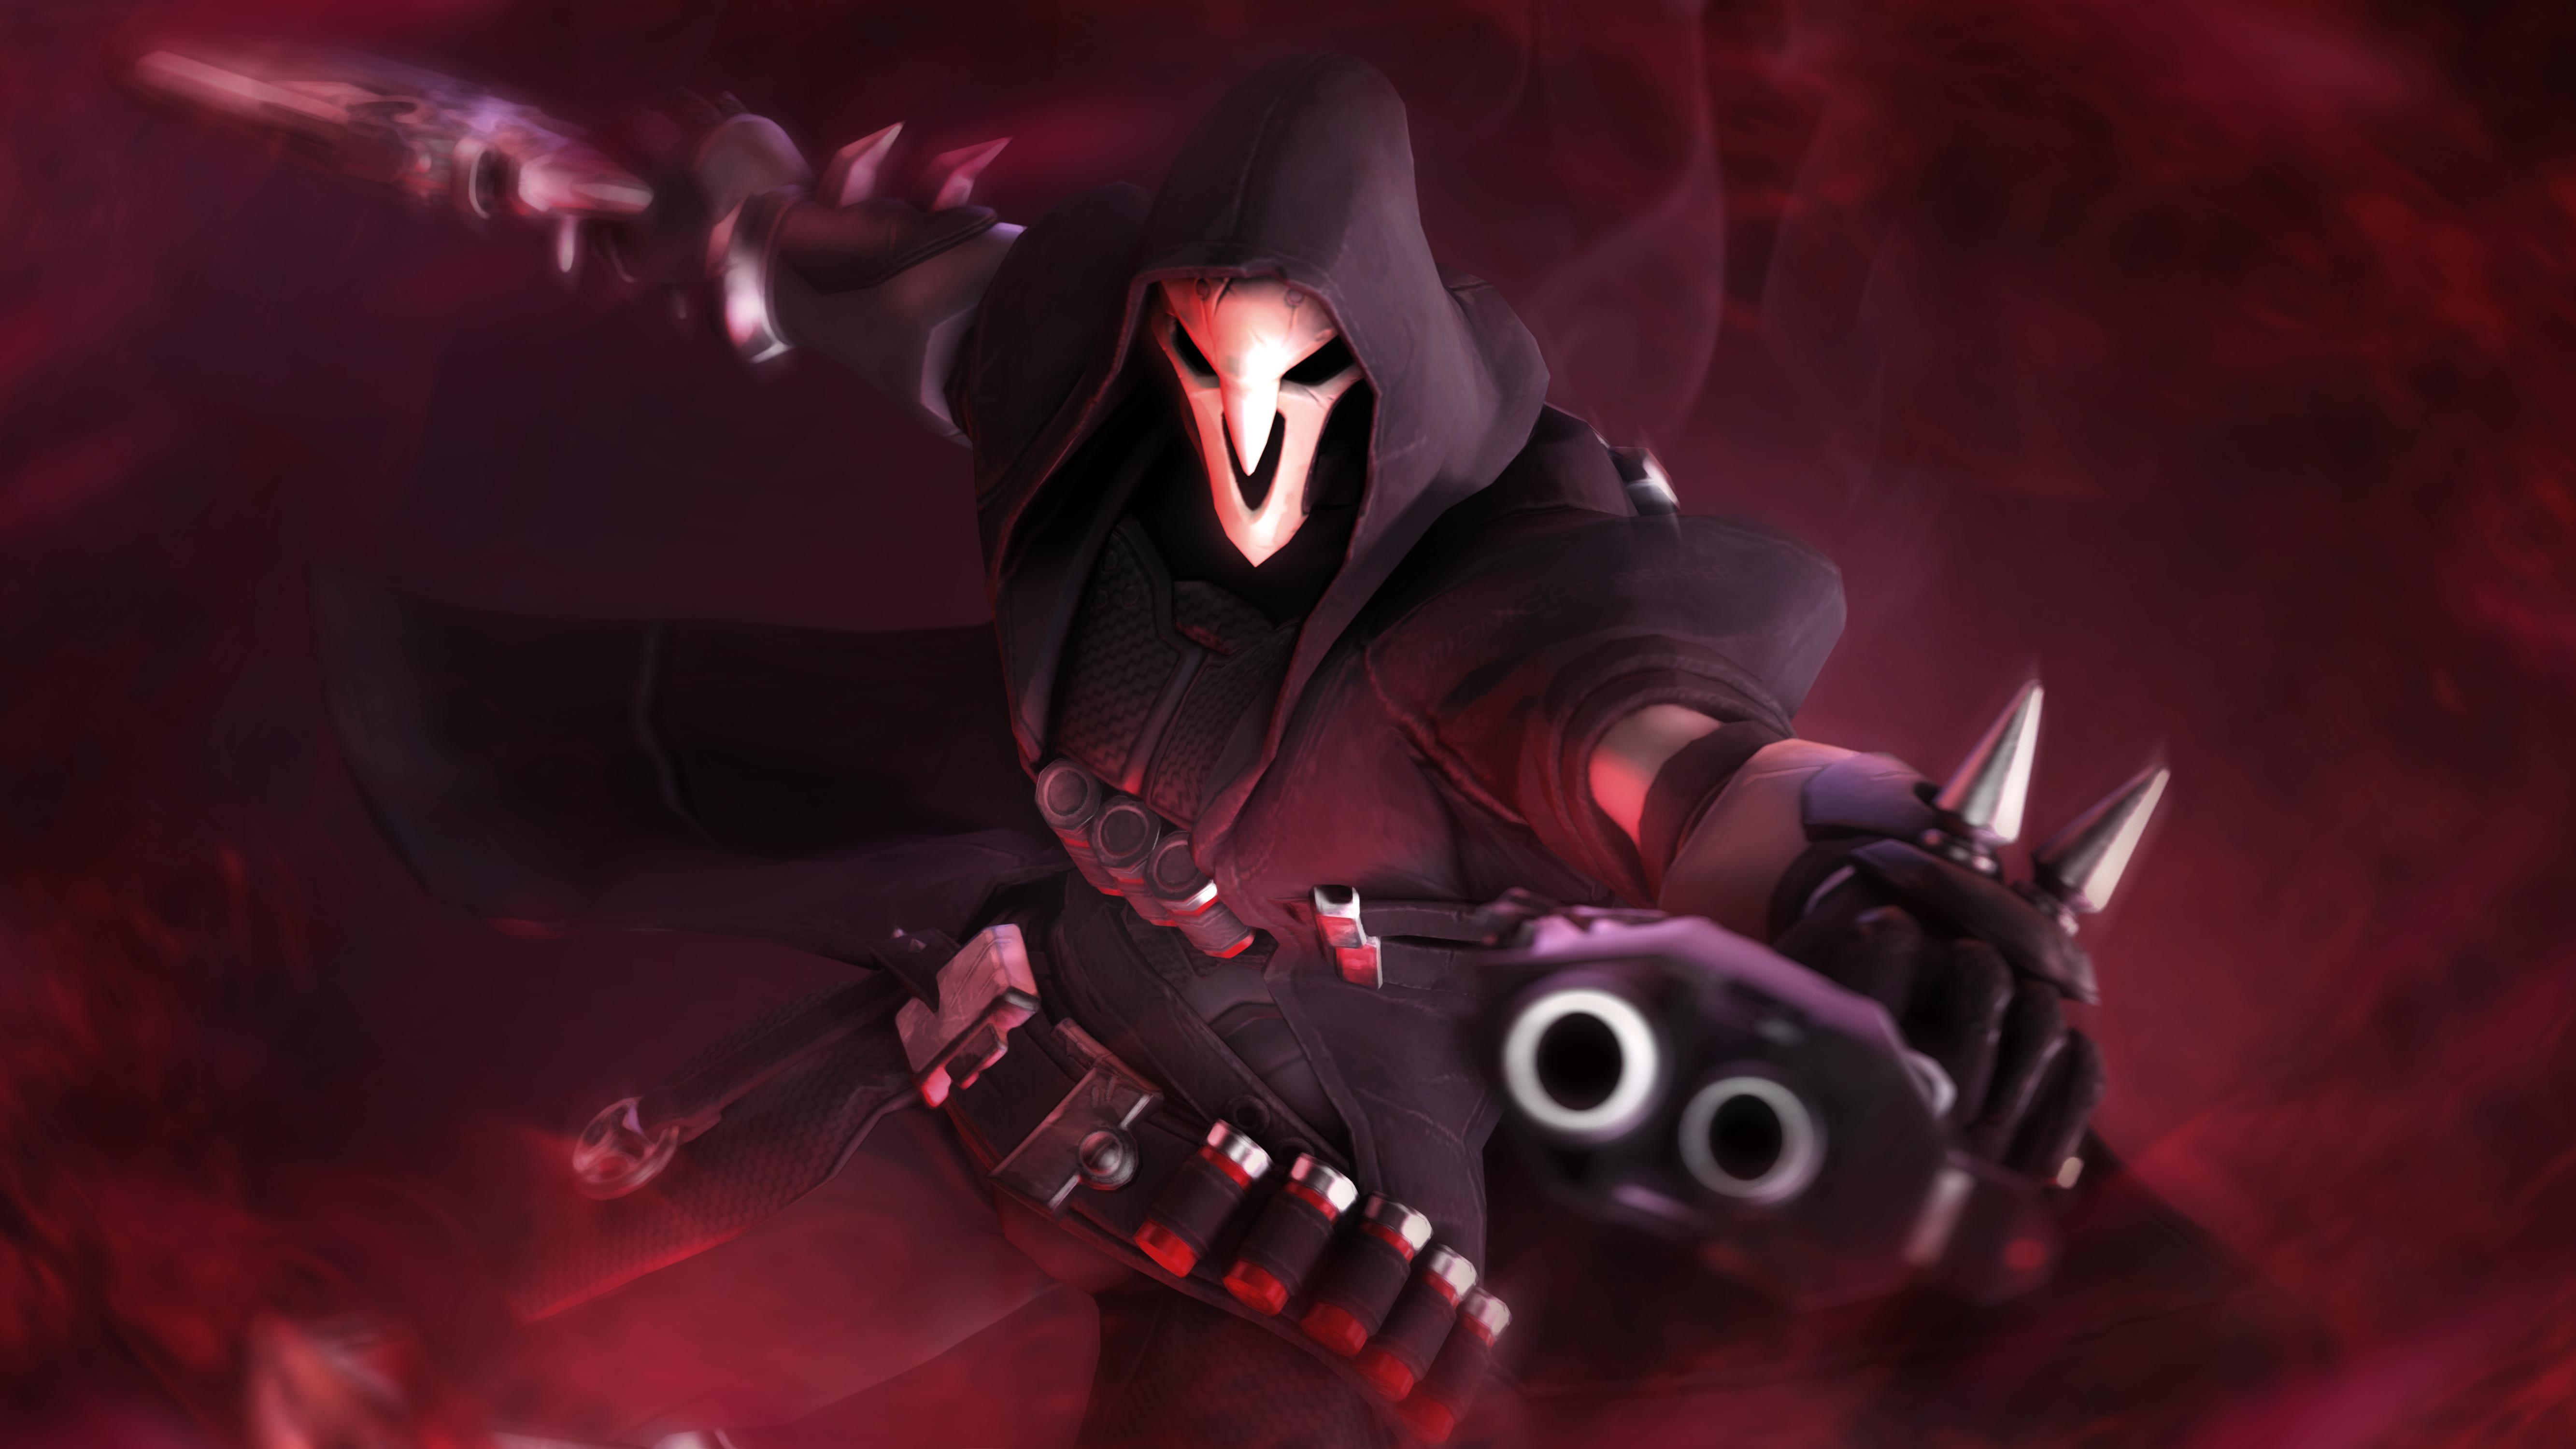 Reaper Overwatch 5k Hd Games 4k Wallpapers Images